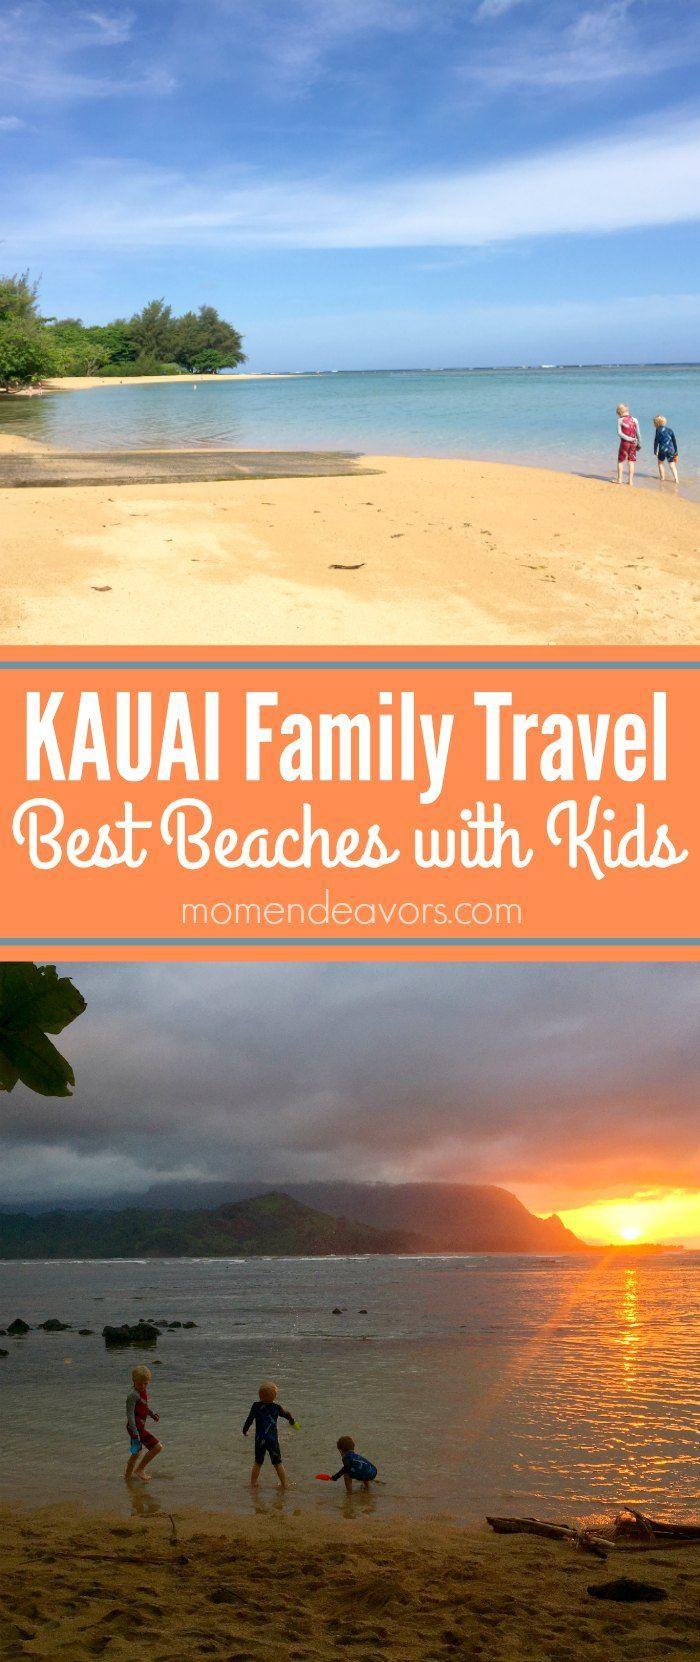 Kauai Family Travel - Best Kauai Beaches with Kids. Details about 5 family-friendly beaches in Kauai, Hawaii.